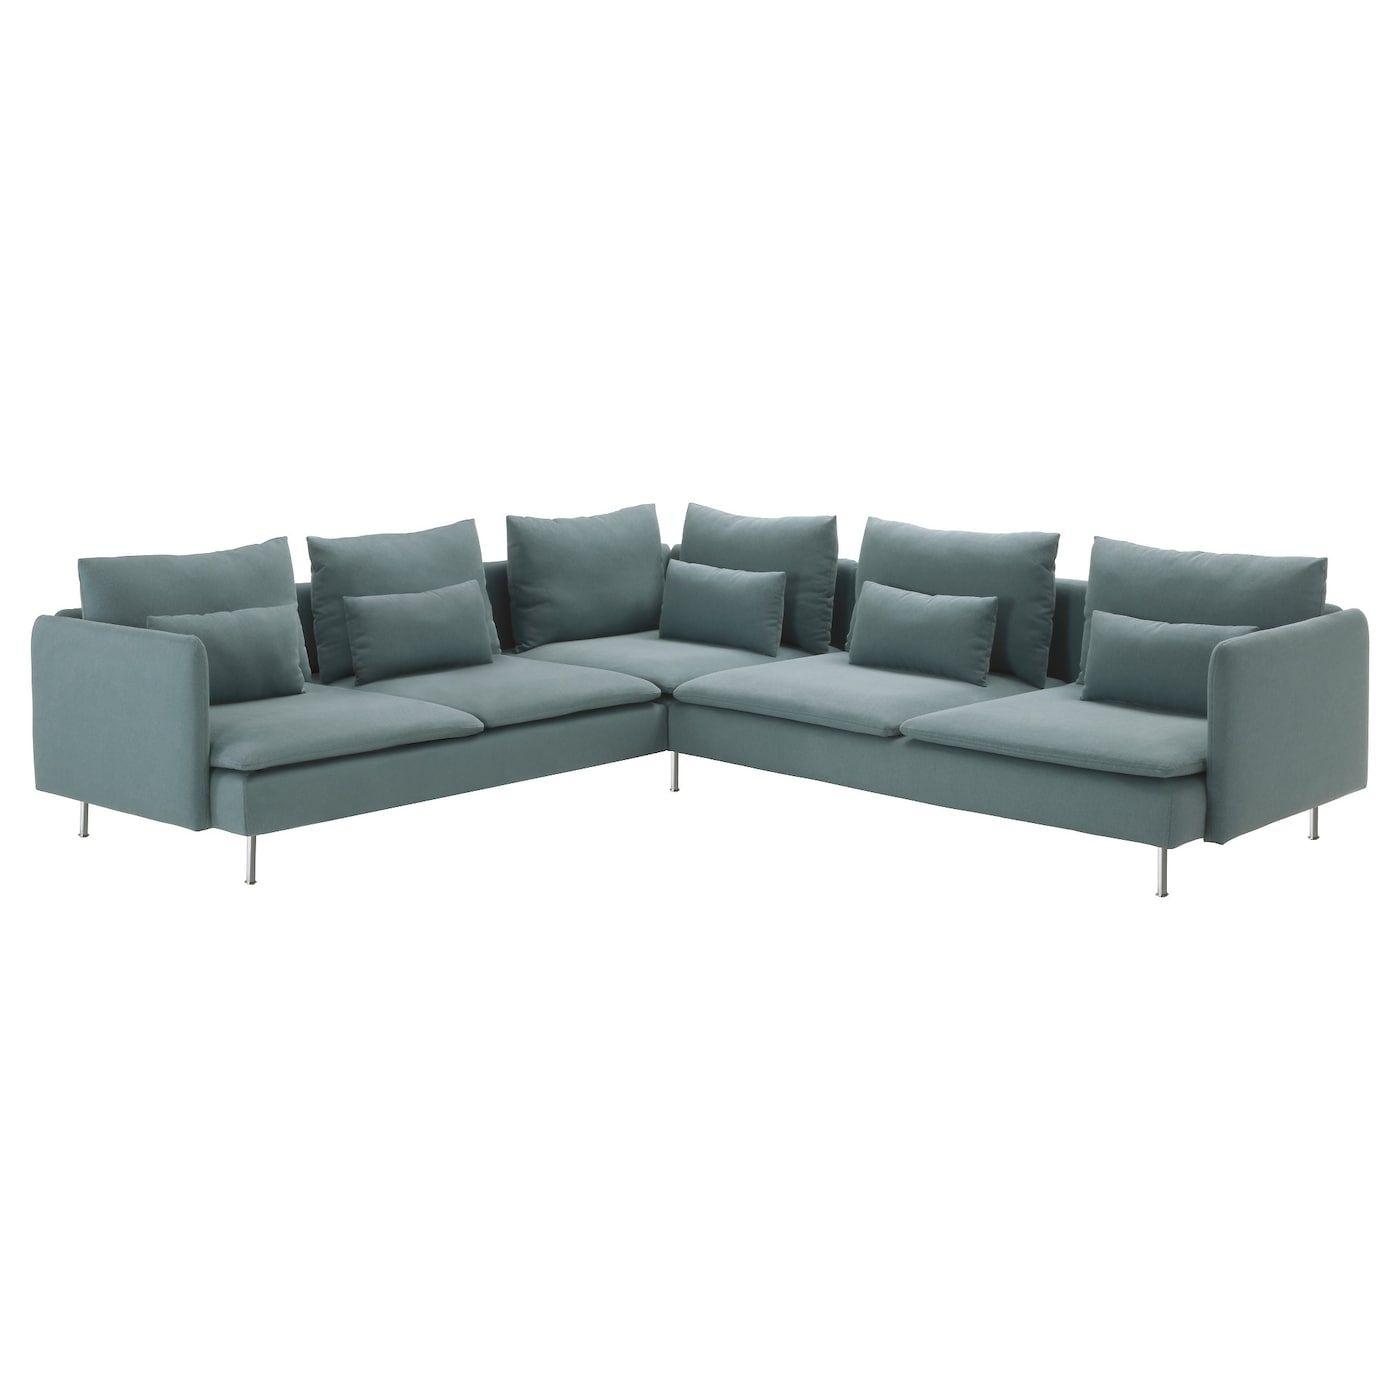 Soderhamn Sectional 5 Seat Finnsta Turquoise Ikea In 2020 Corner Sofa Modular Corner Sofa Fabric Sofa